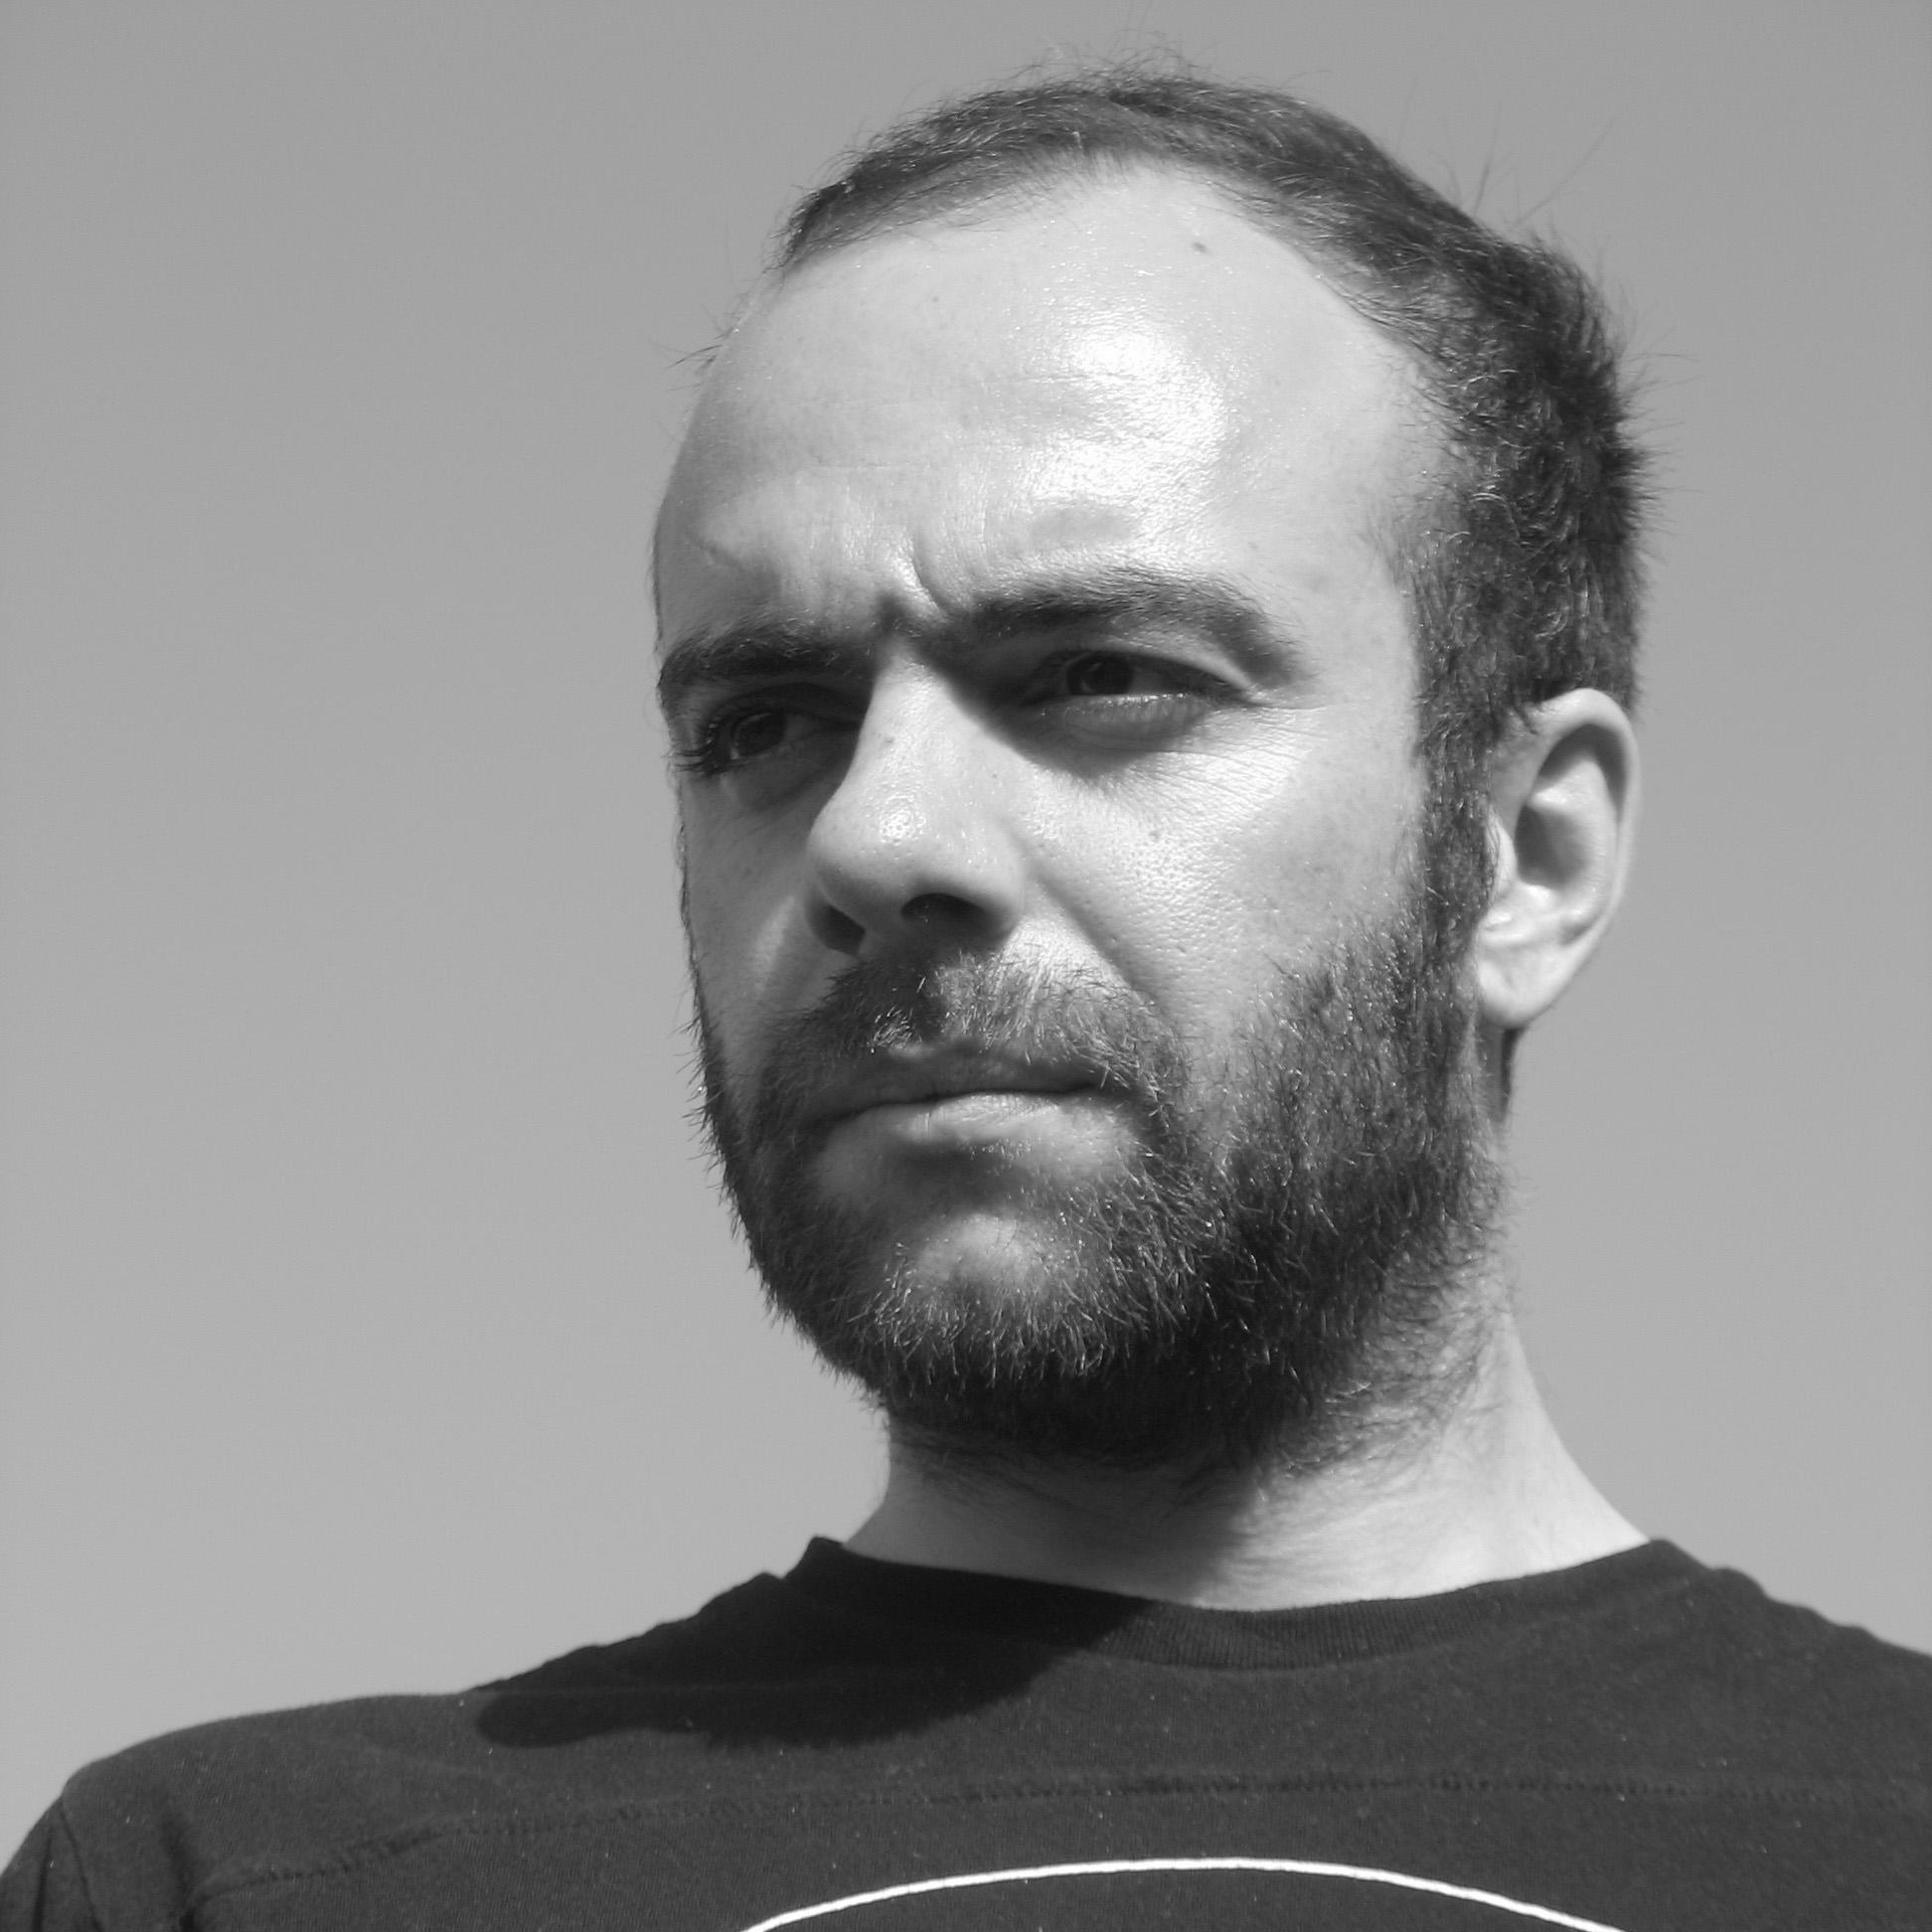 Víctor Moreno Rodríguez